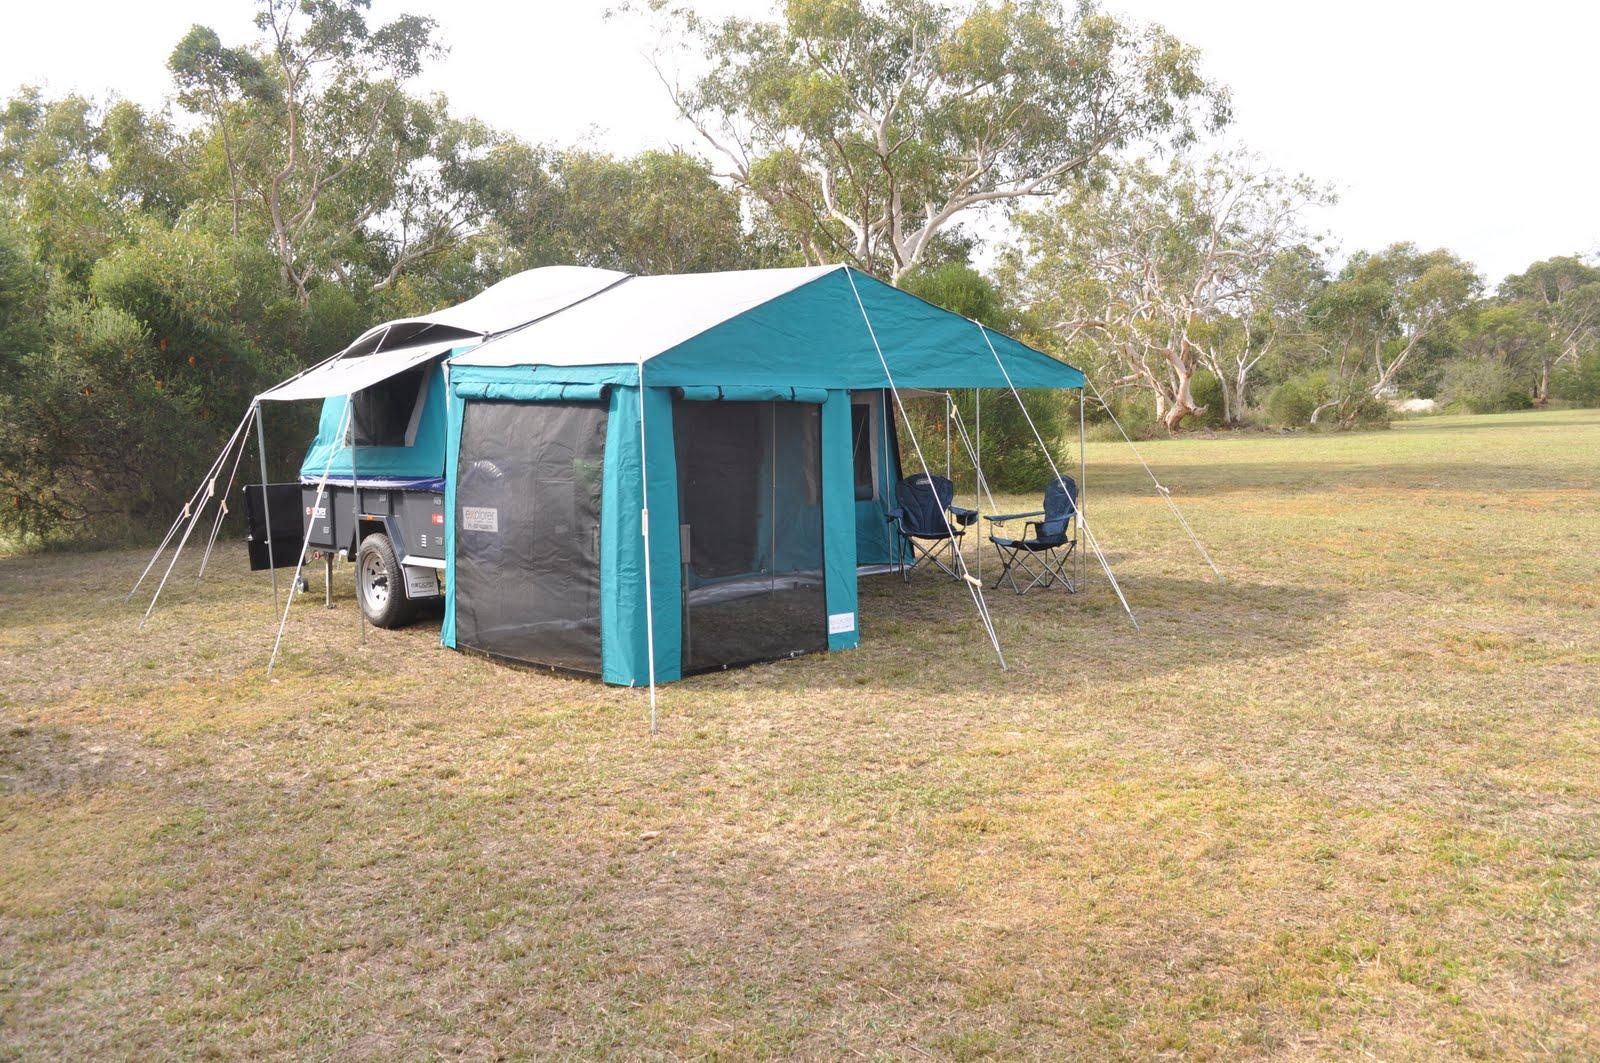 explorer campers wentworth walk